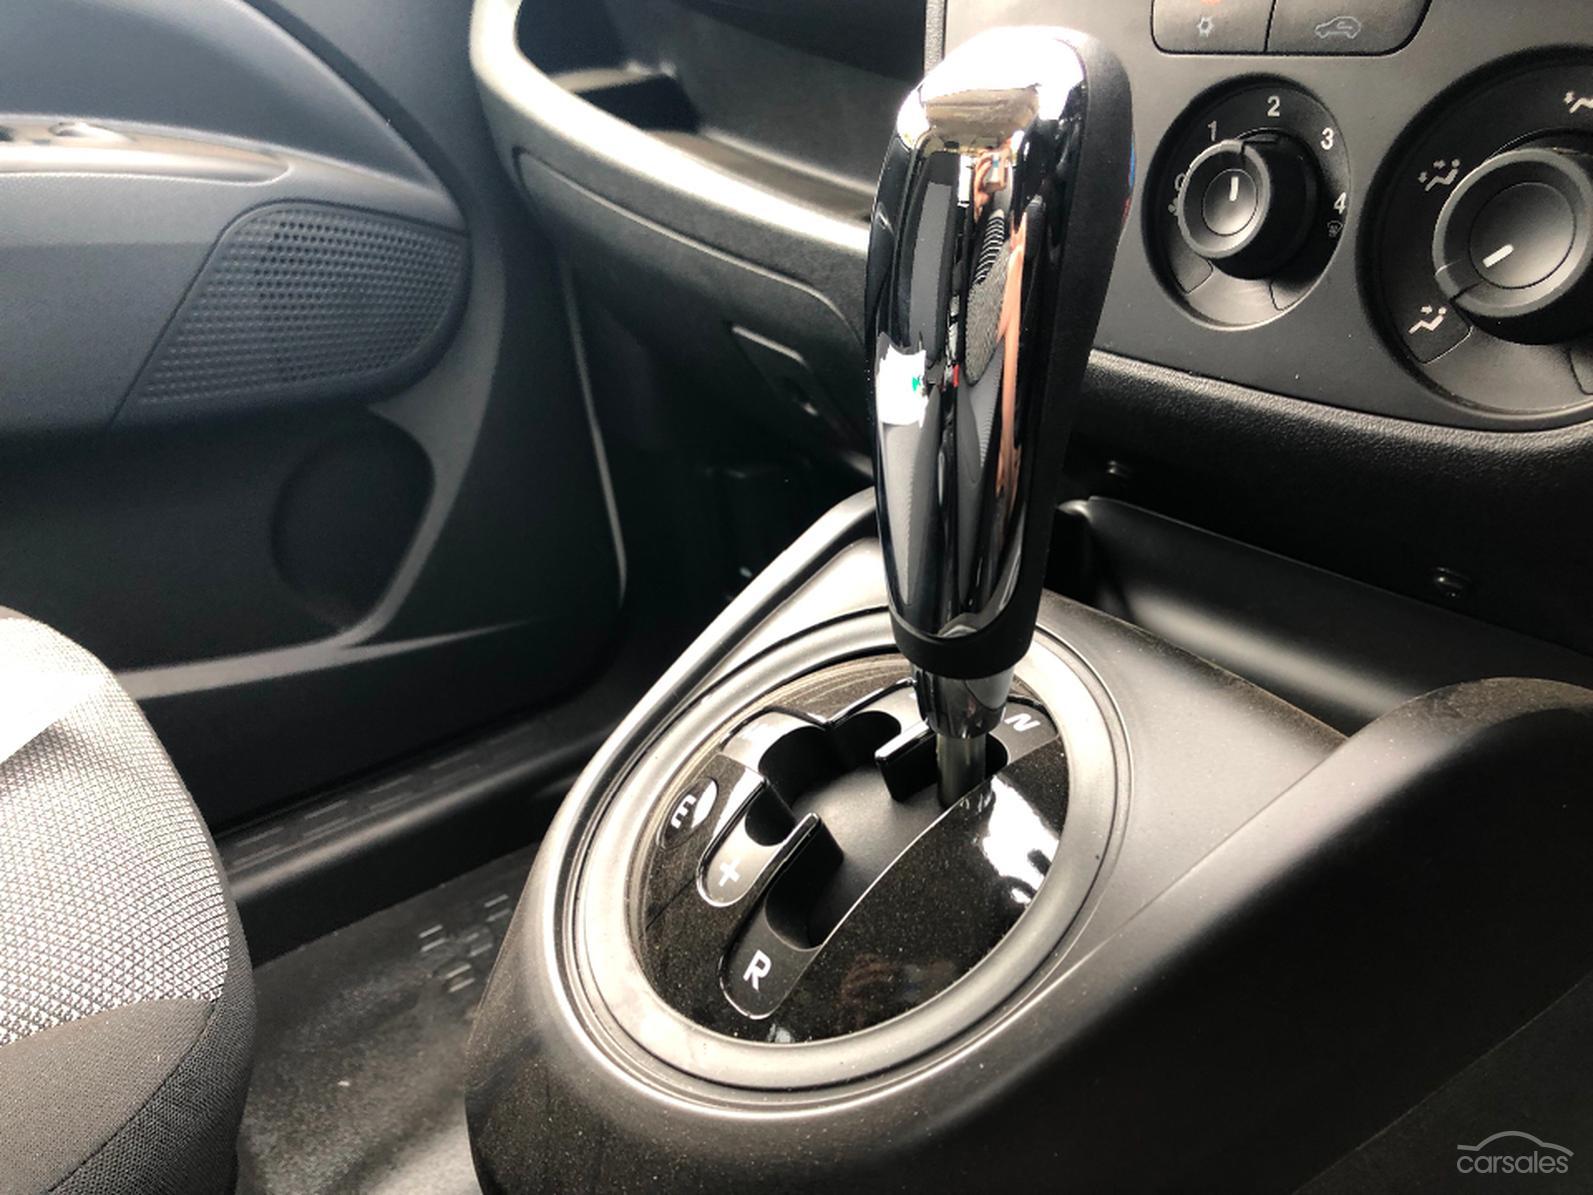 0464f0114d 2017 Fiat Doblo SWB Auto-OAG-AD-16388167